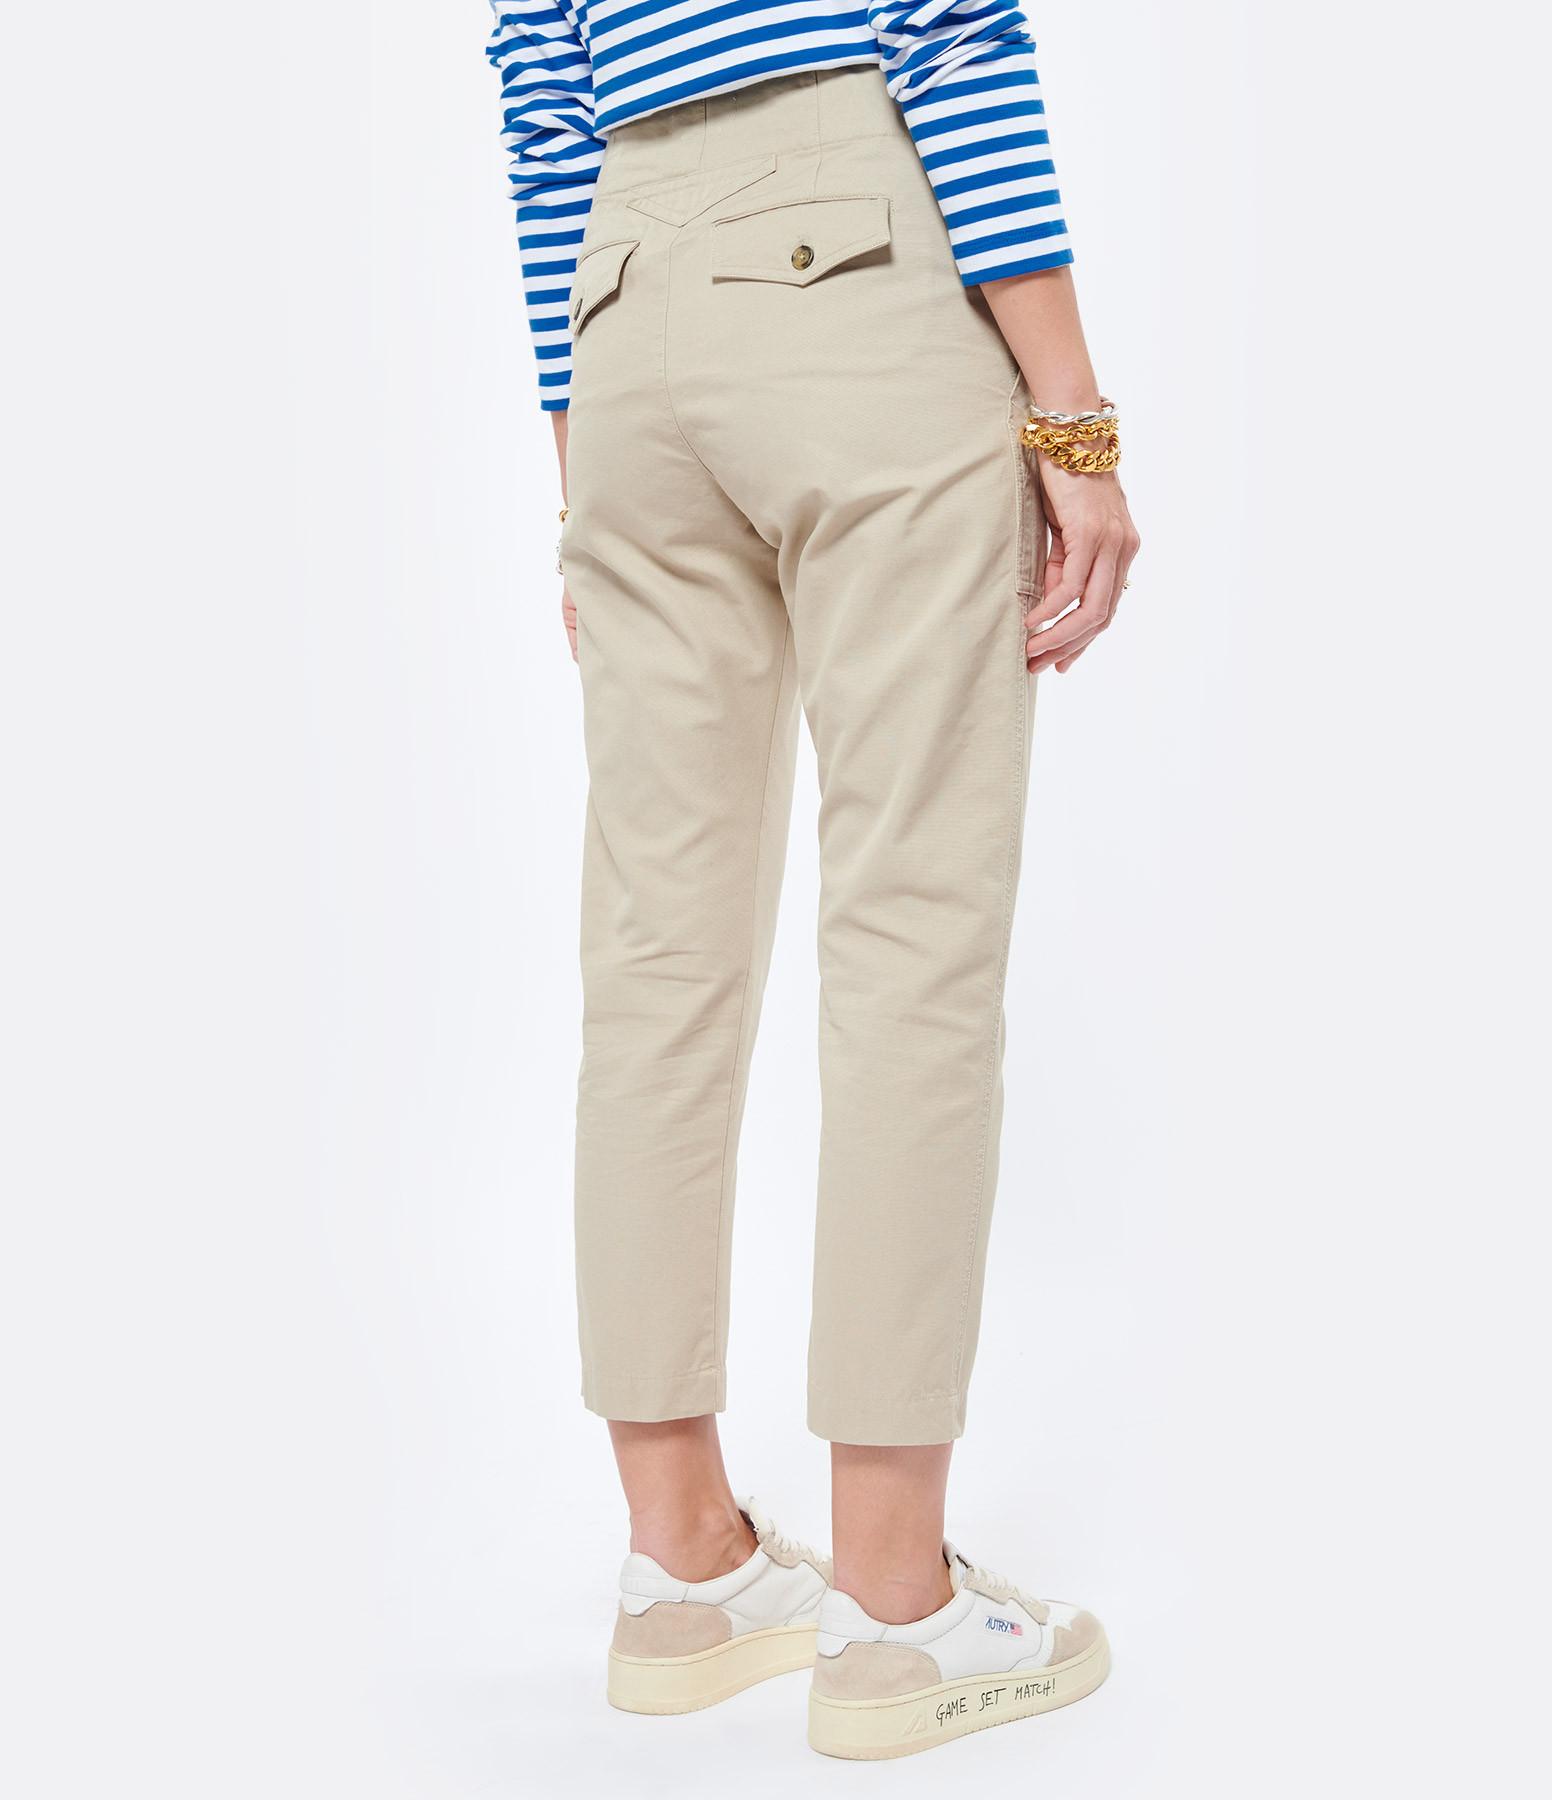 ISABEL MARANT ÉTOILE - Pantalon Pralunia Coton Beige